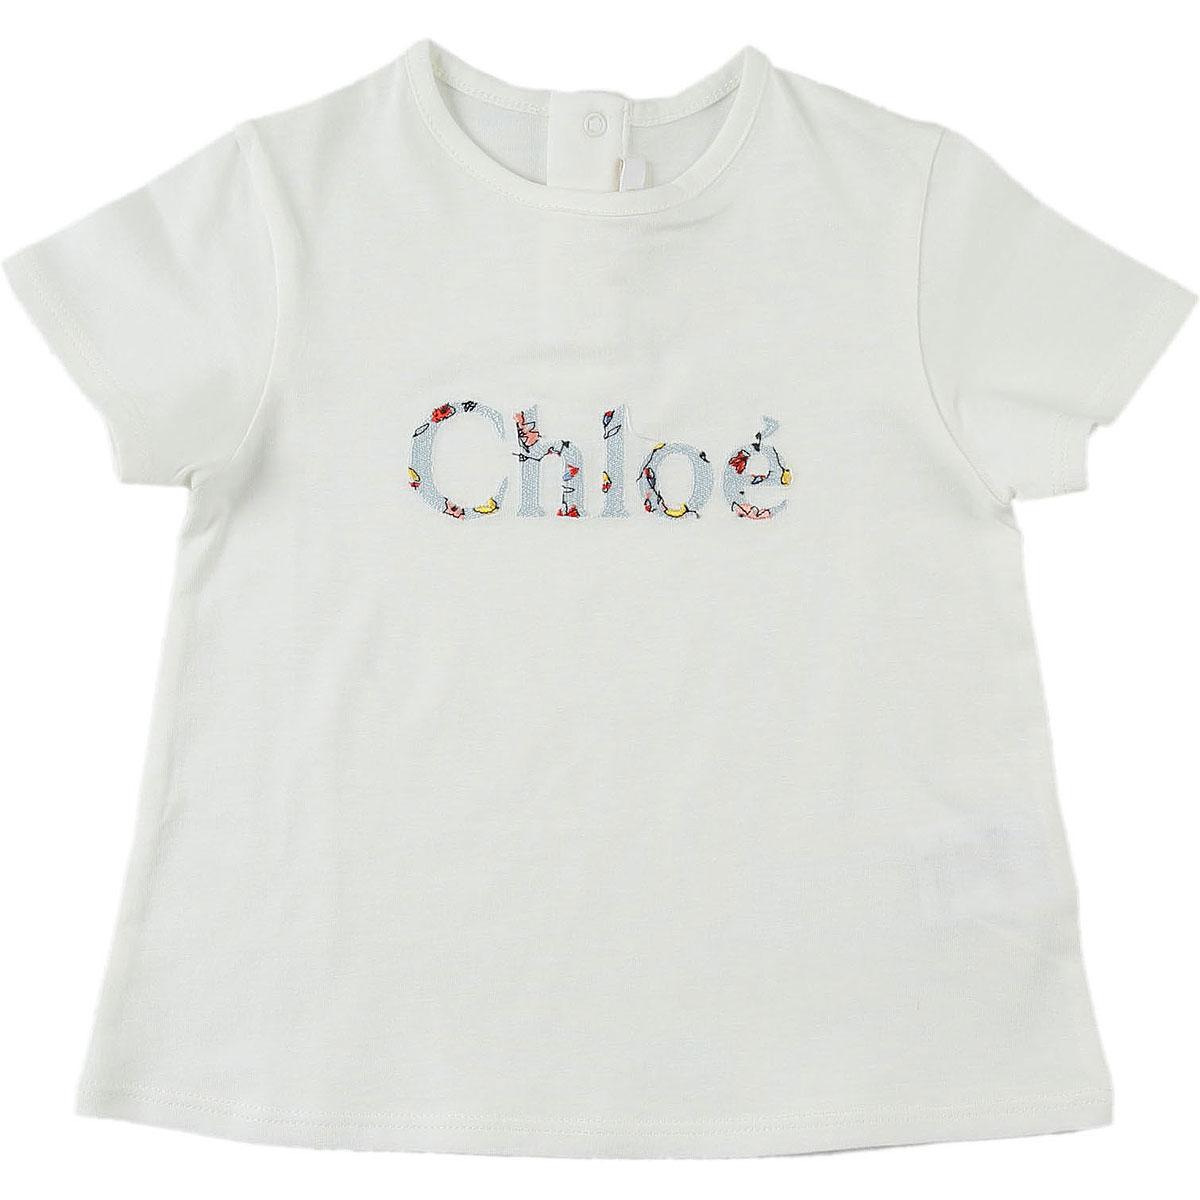 Chloe Baby T-Shirt For Girls İndirimli Satış, Beyaz, Pamuk, 2019, 12M 18M 2Y 6M 9M